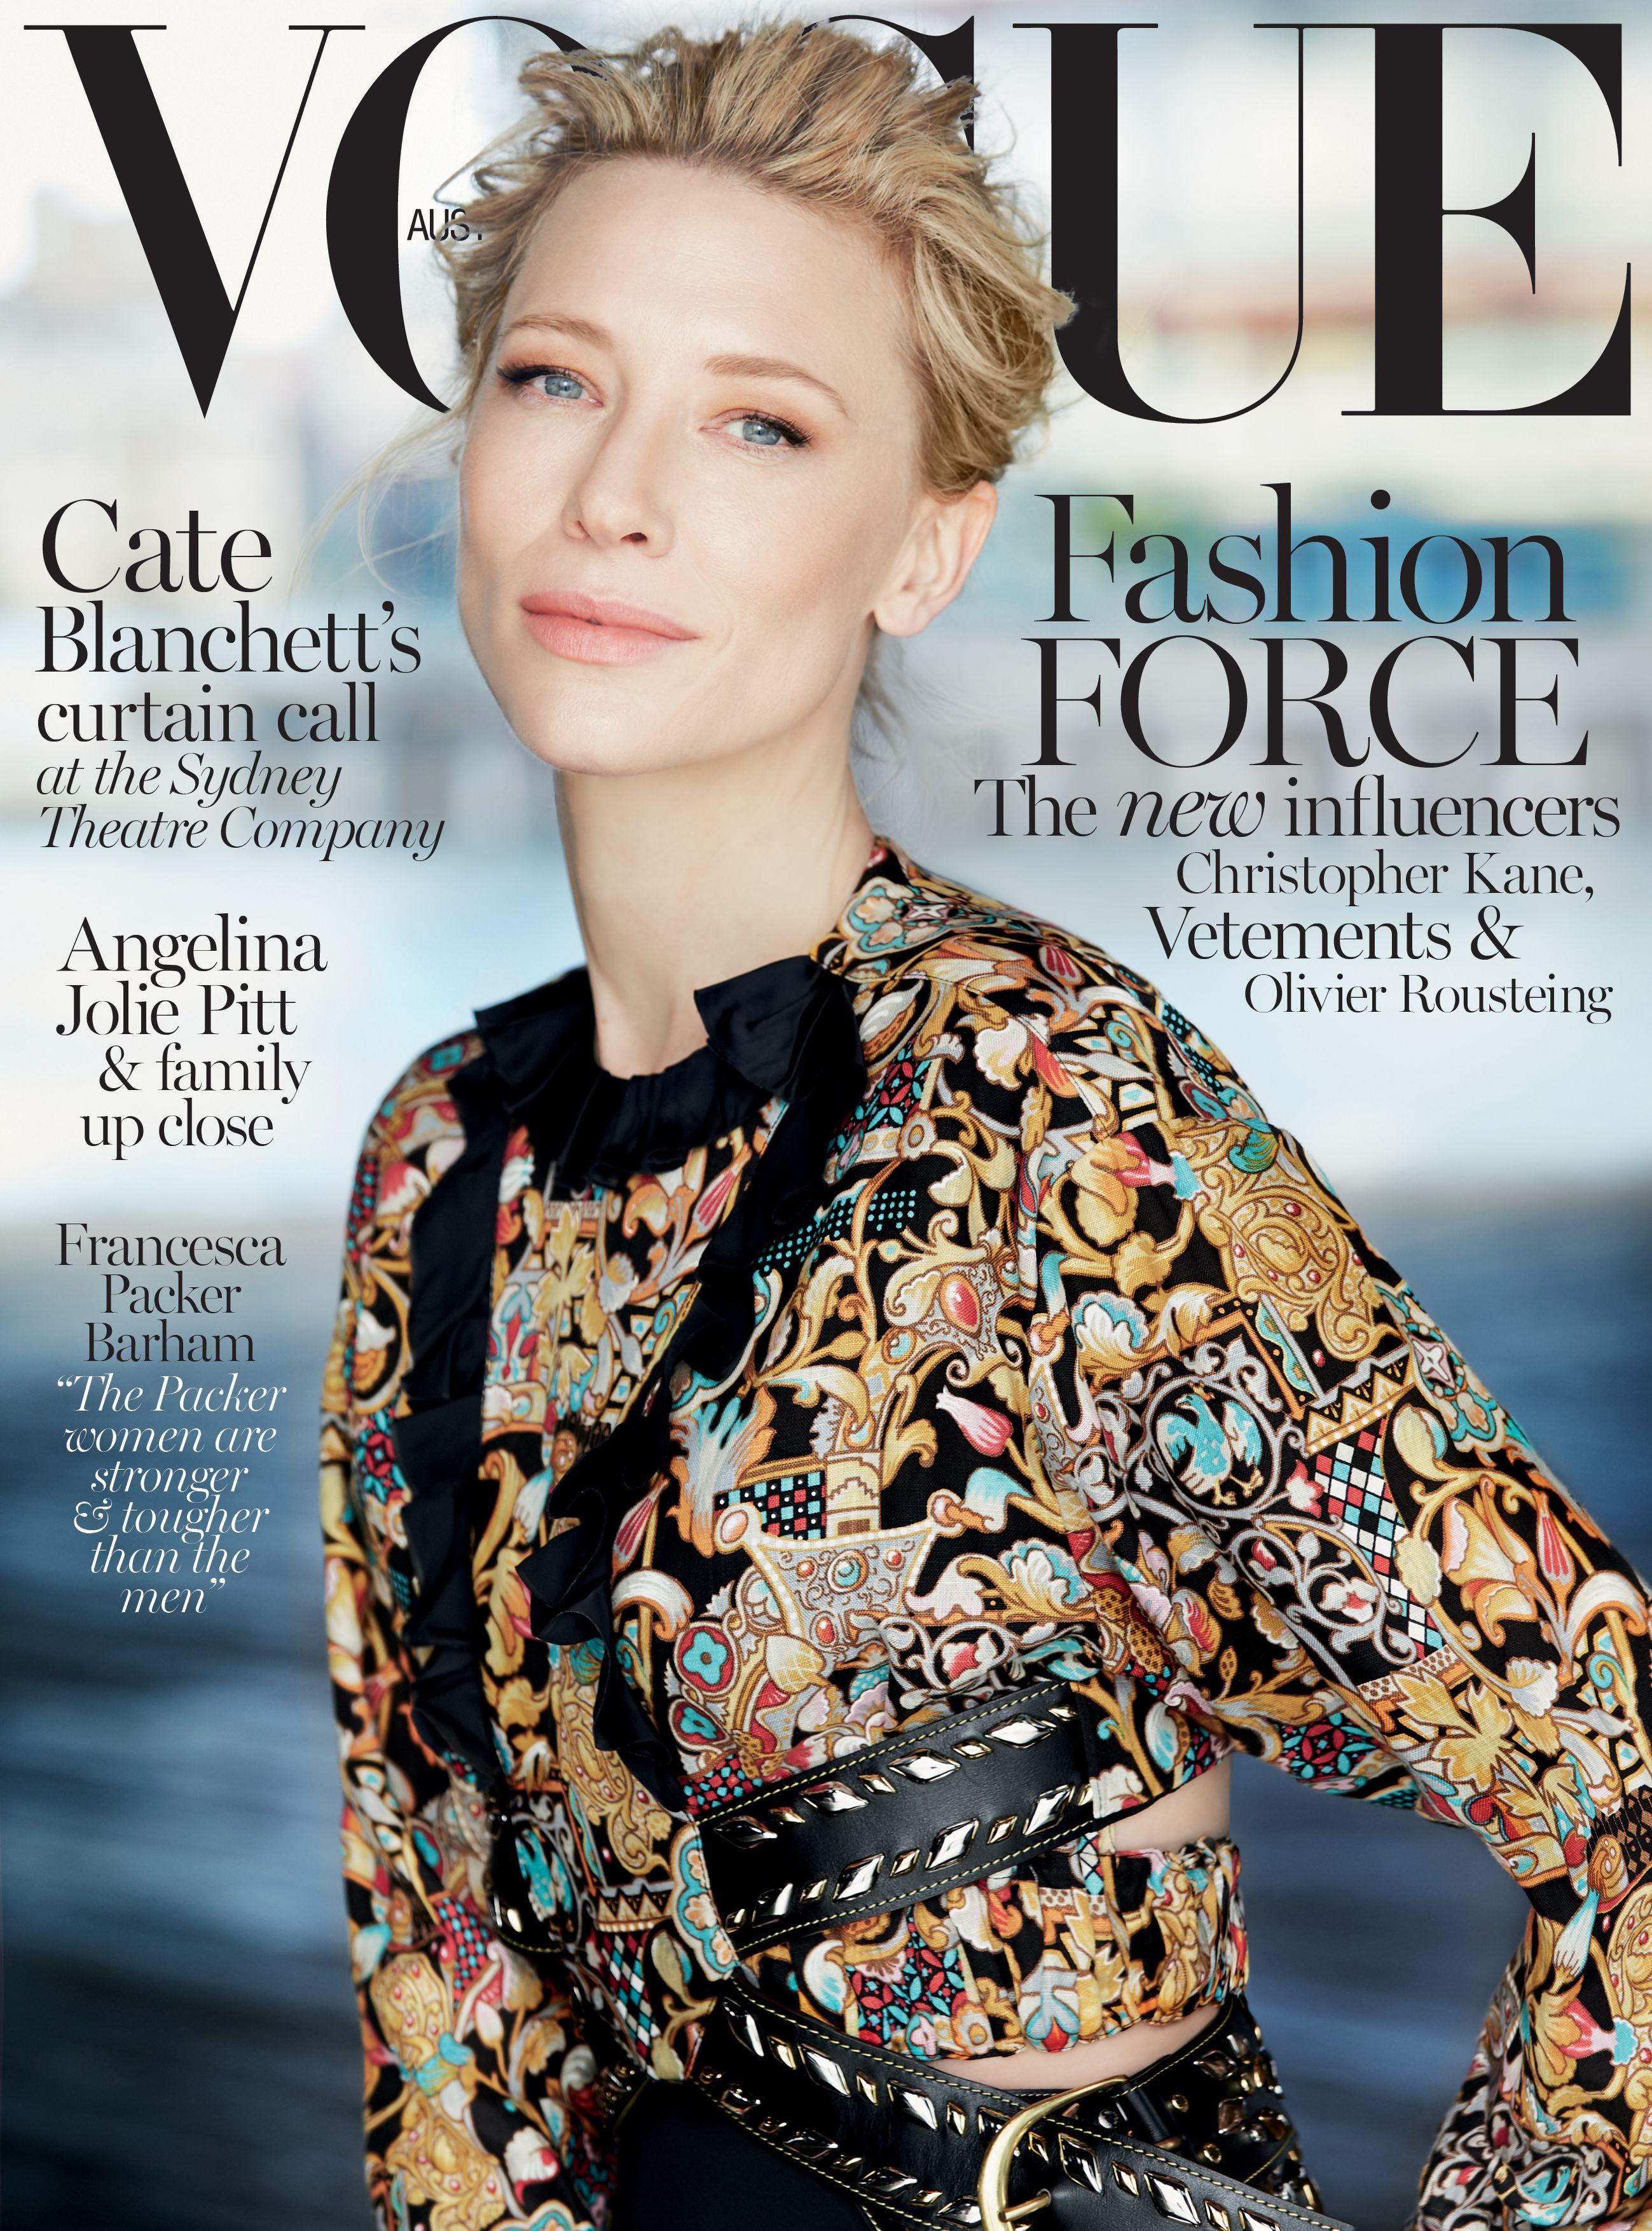 Turboimagehost.com Ls Island Cate Blanchett for Vogue Australia December 2015